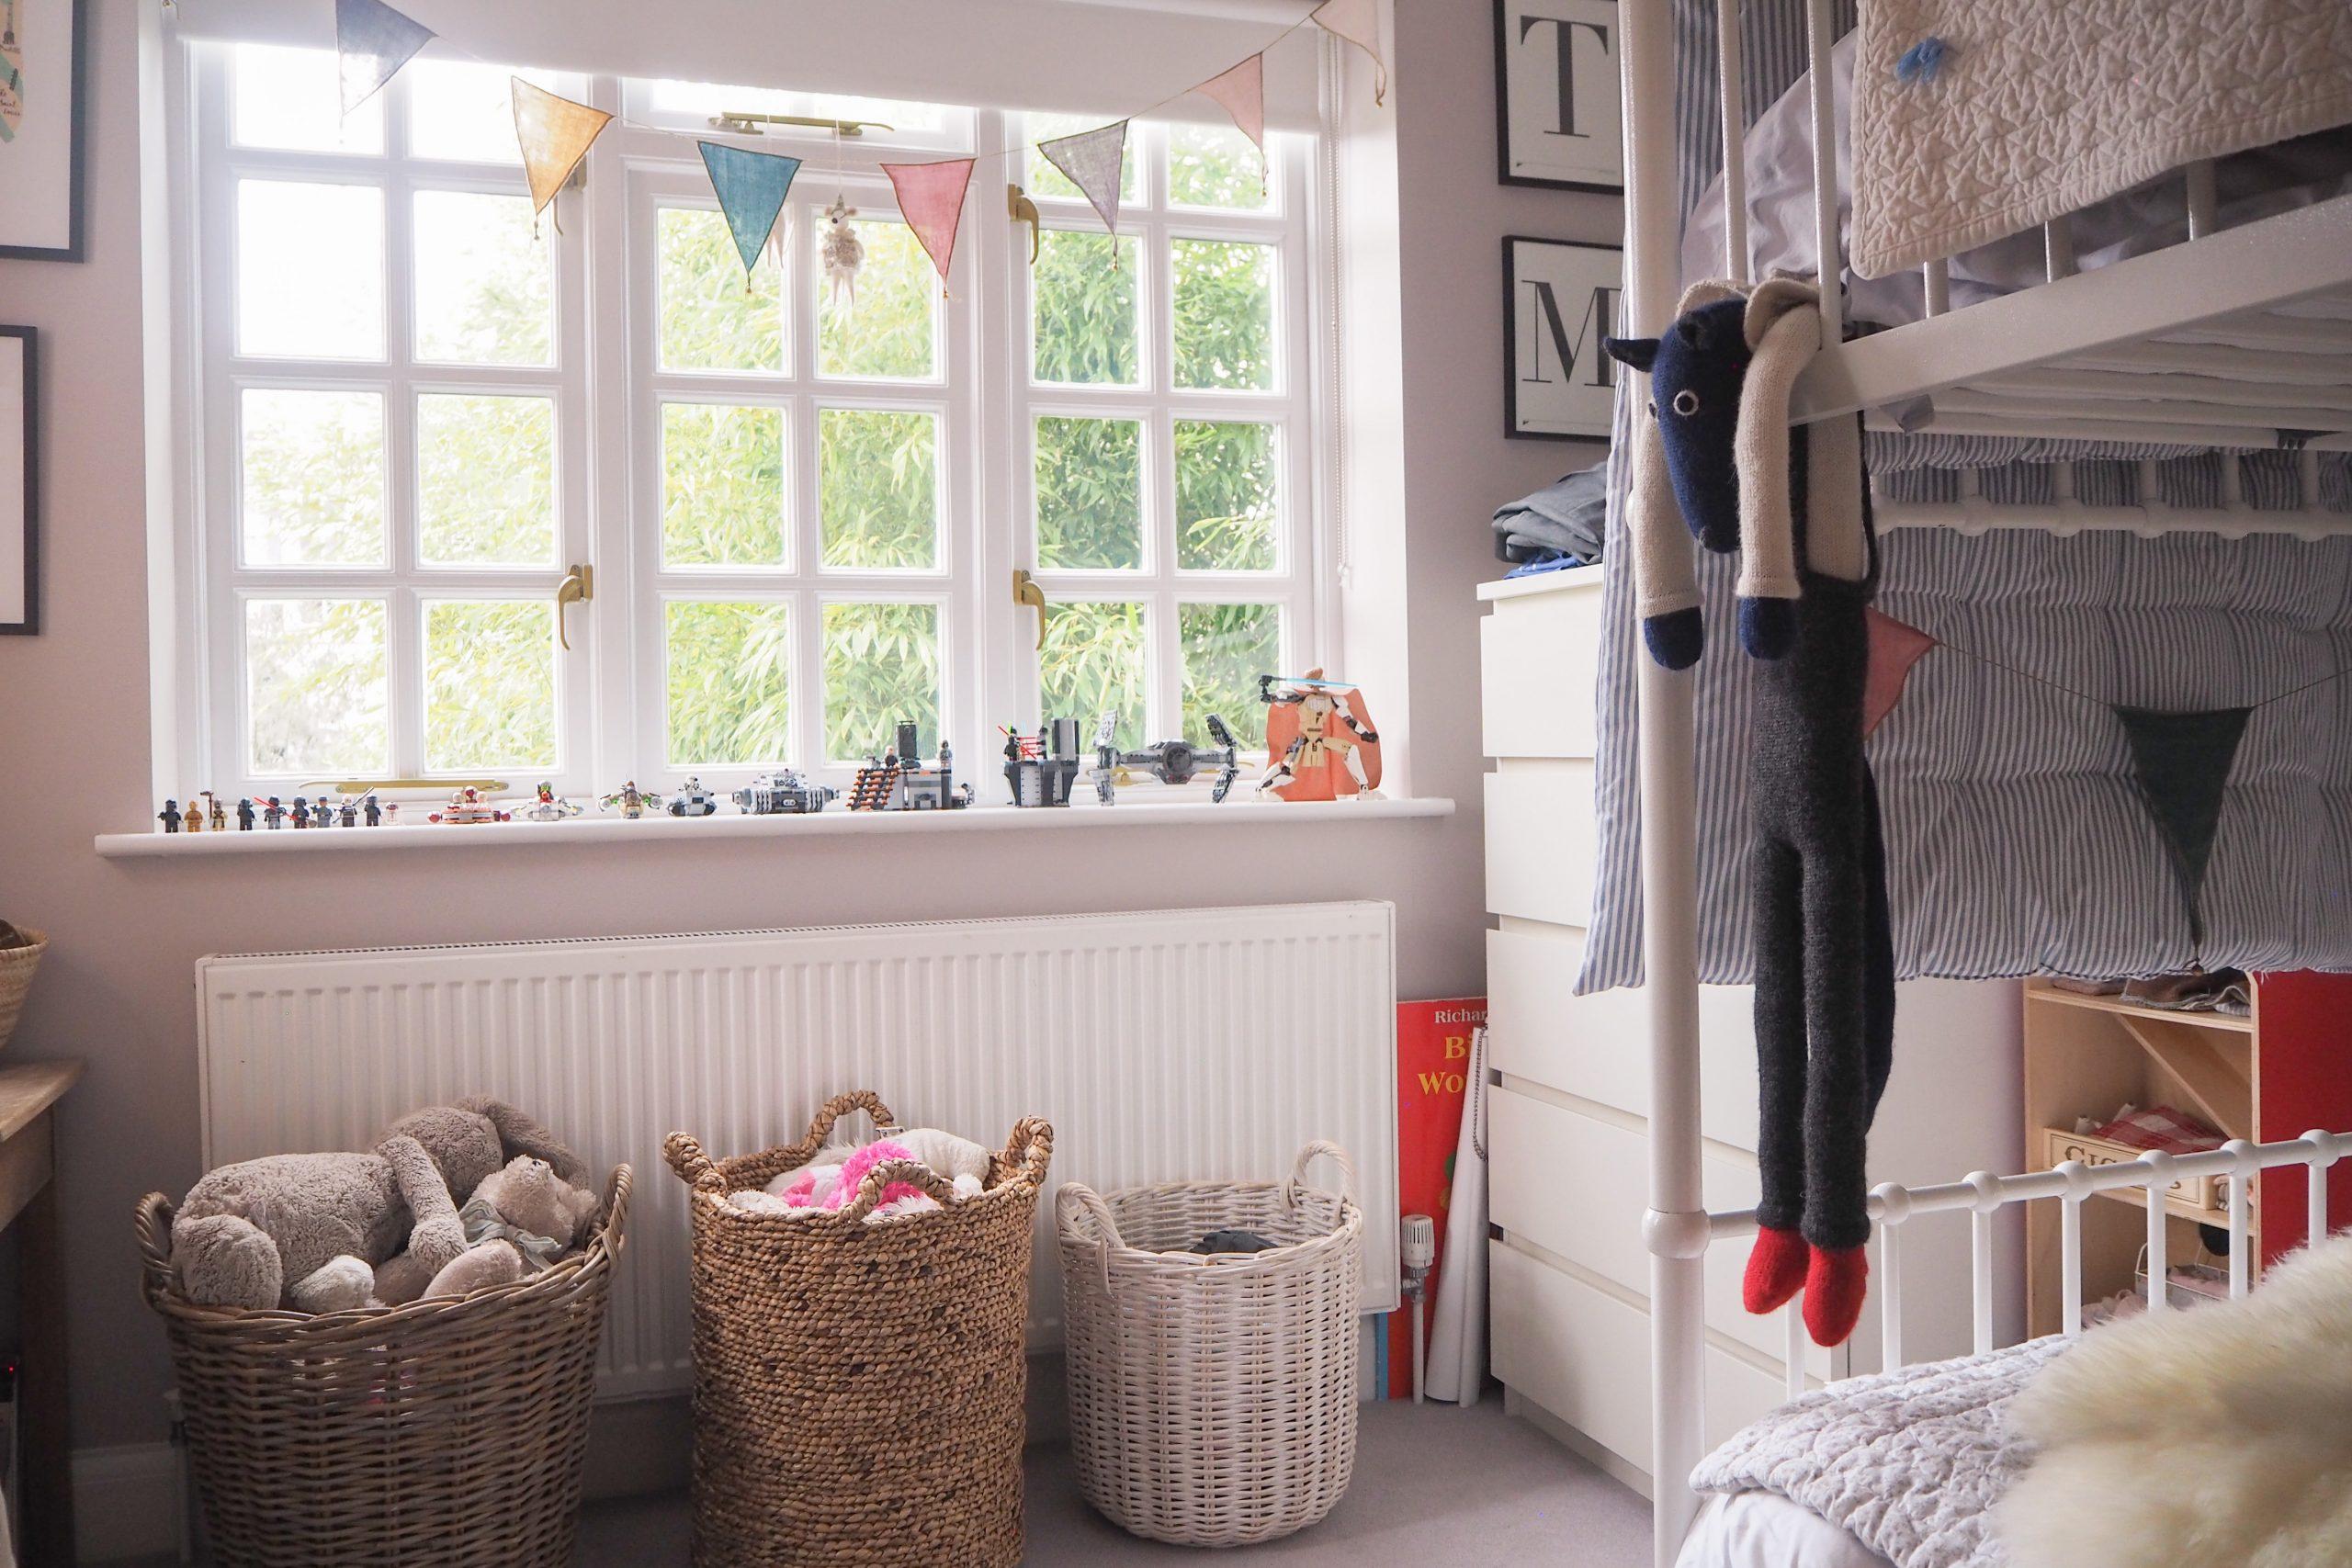 Interiors envy: Sarah Clark from Little